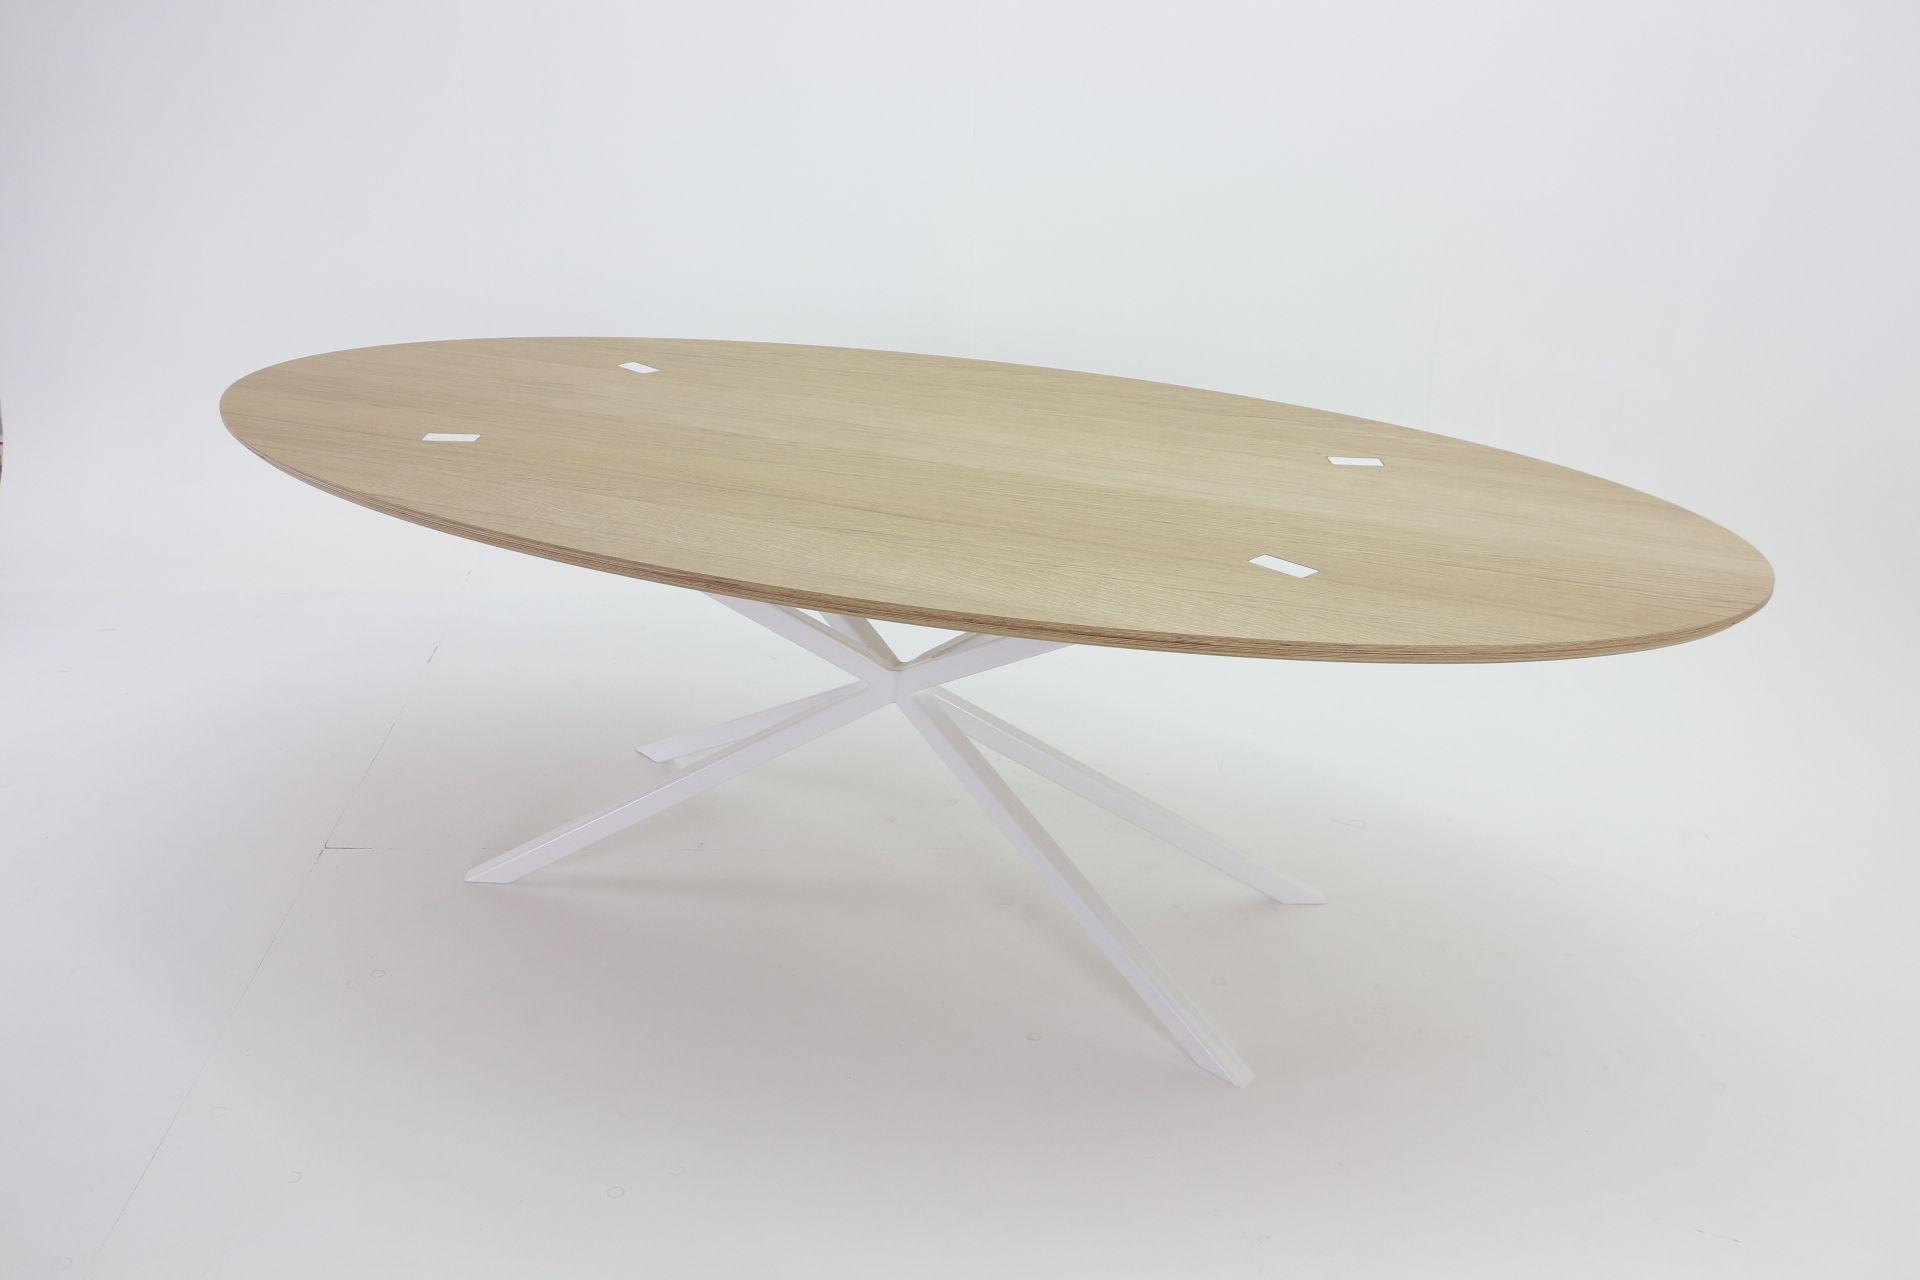 Tafel tables by belgian designer and maker lennart van